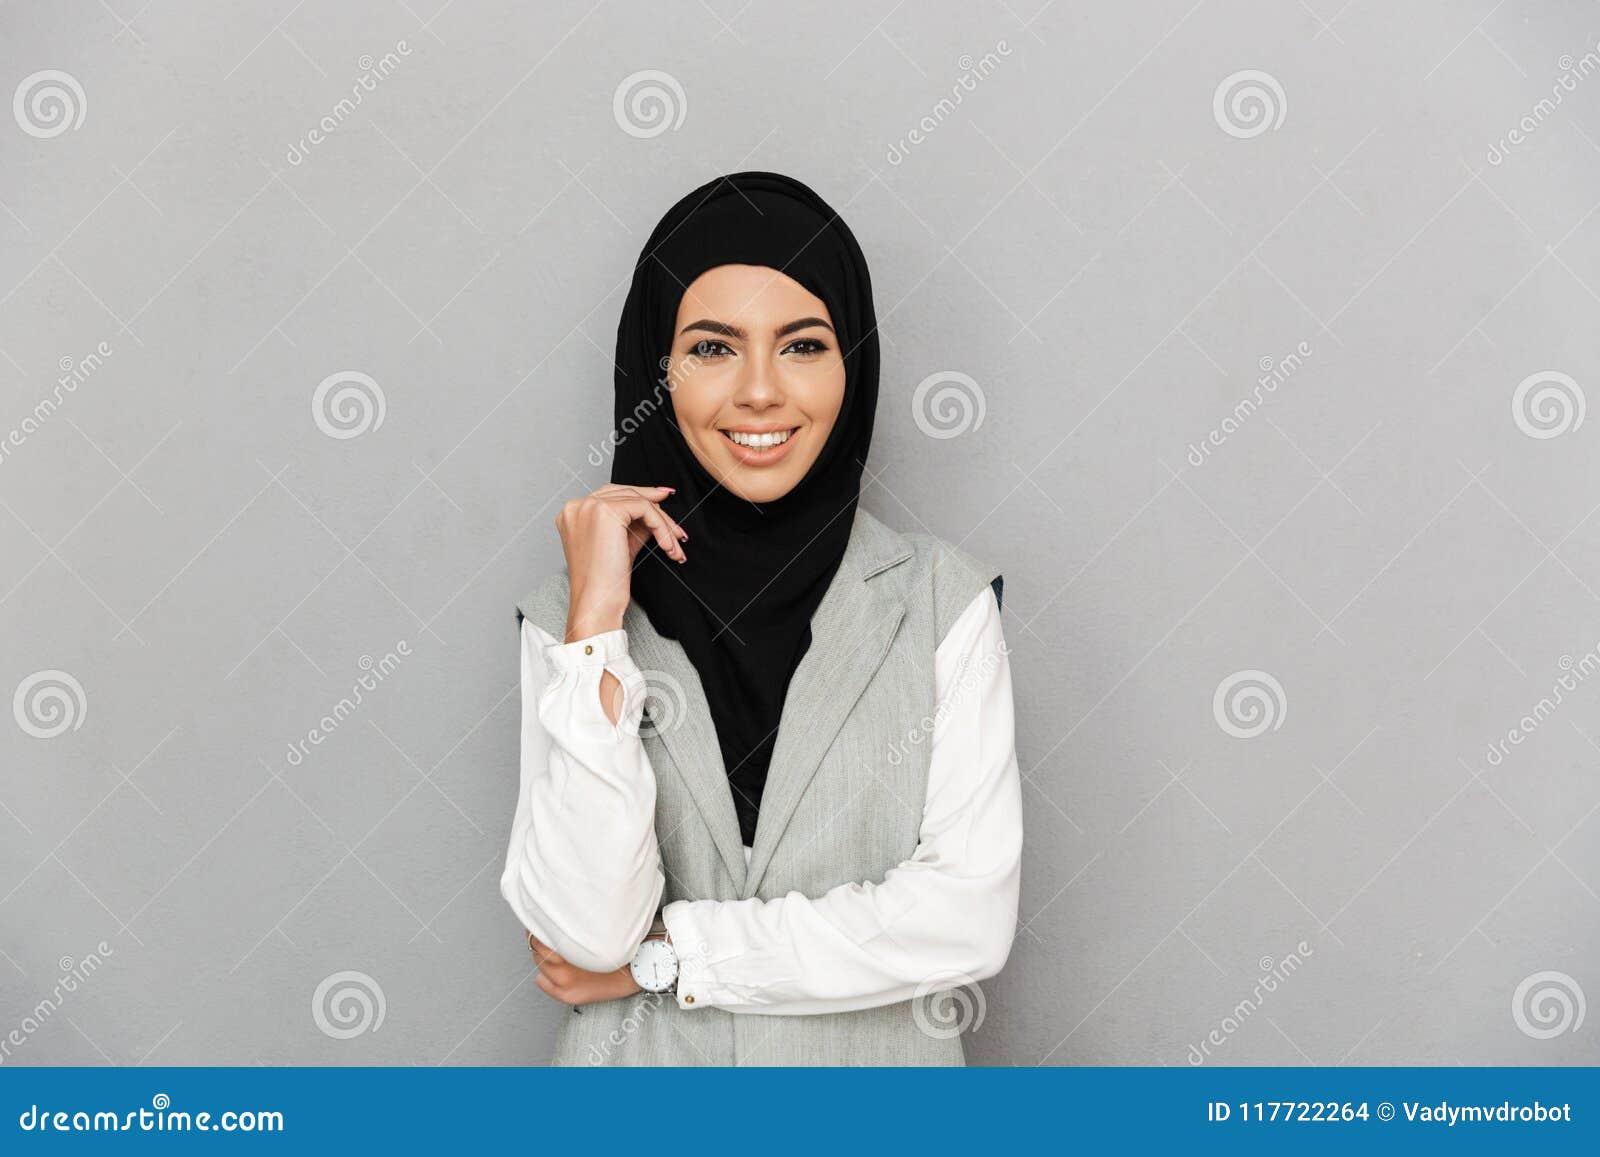 Retrato da mulher elegante muçulmana 20s no sorriso e no lookin do hijab